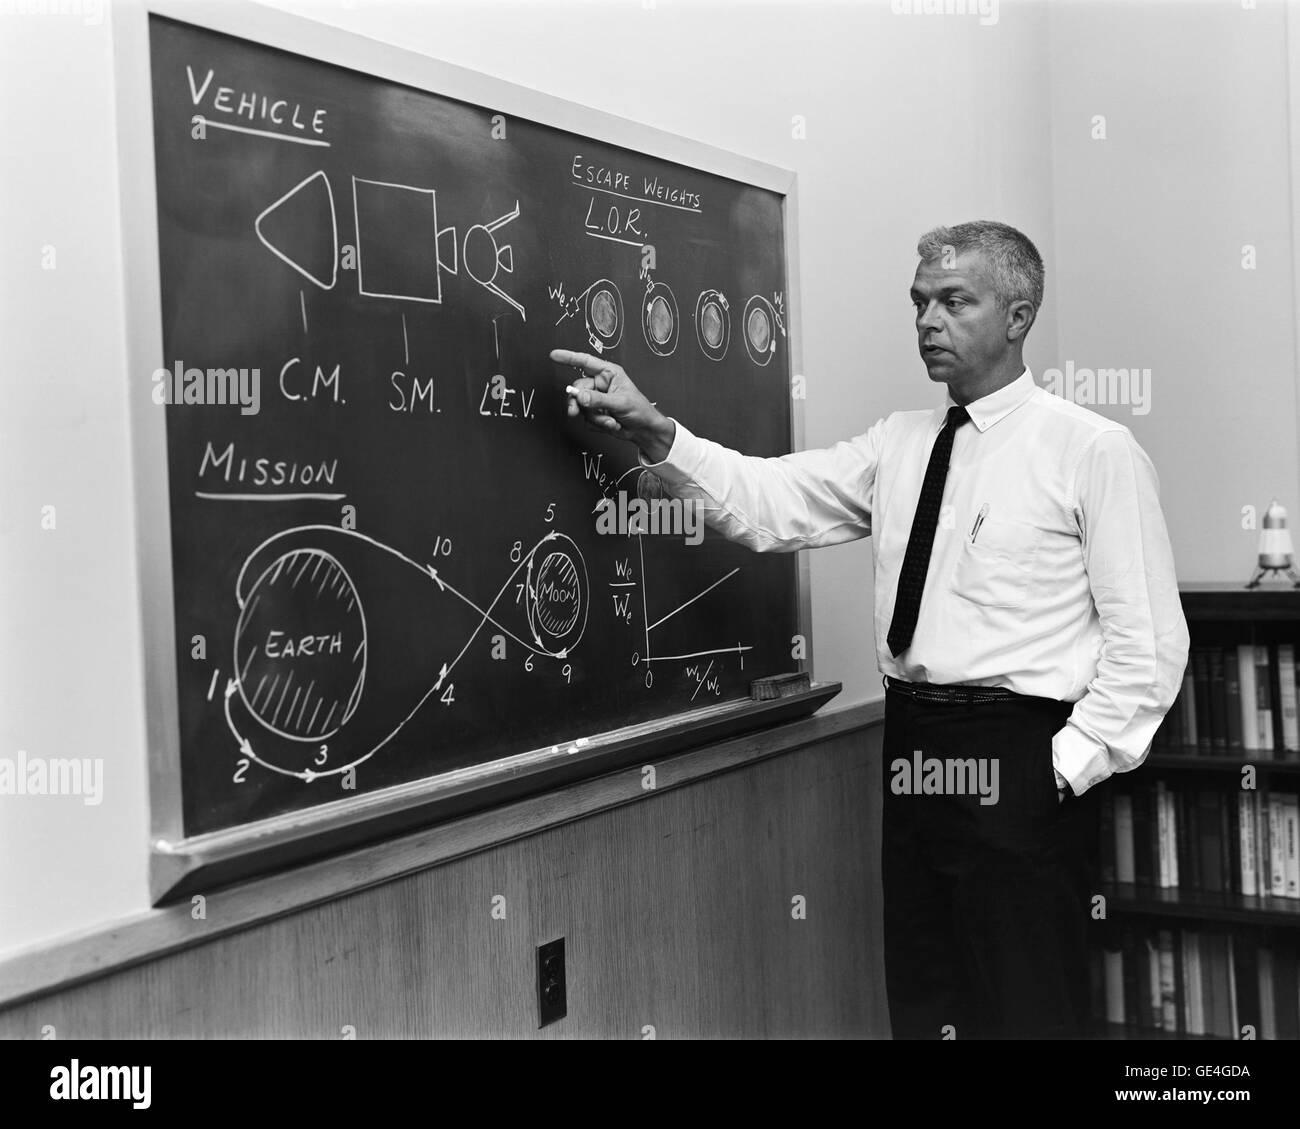 John C. Houbolt at blackboard, showing his space rendezvous concept for lunar landings. Lunar Orbital Rendezvous - Stock Image